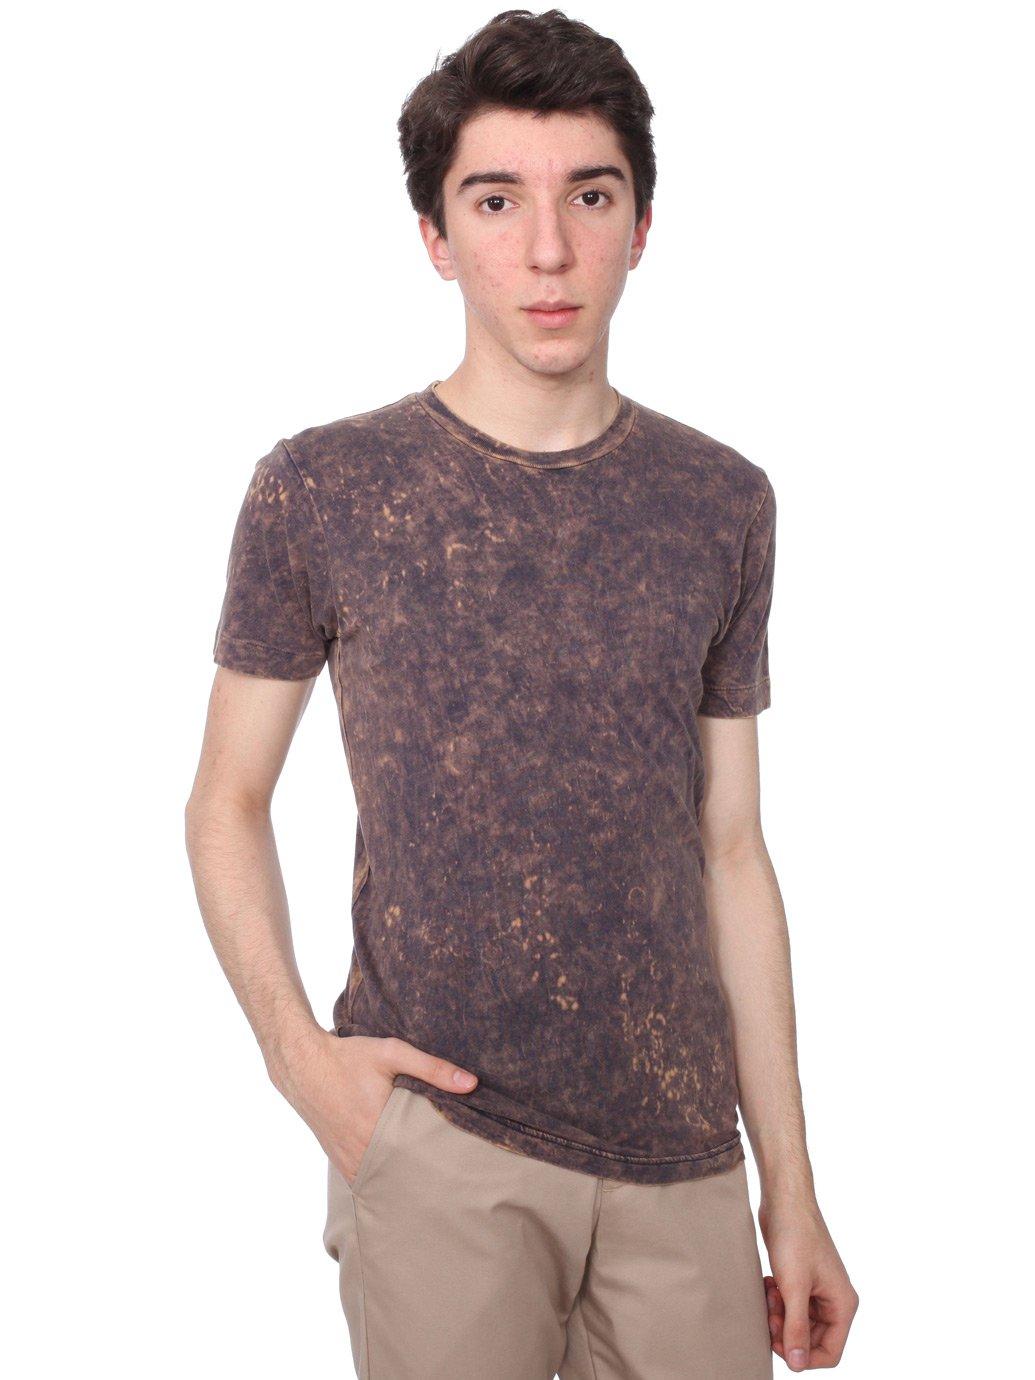 American apparel acid wash jersey short sleeve t shirt for American apparel custom t shirt printing